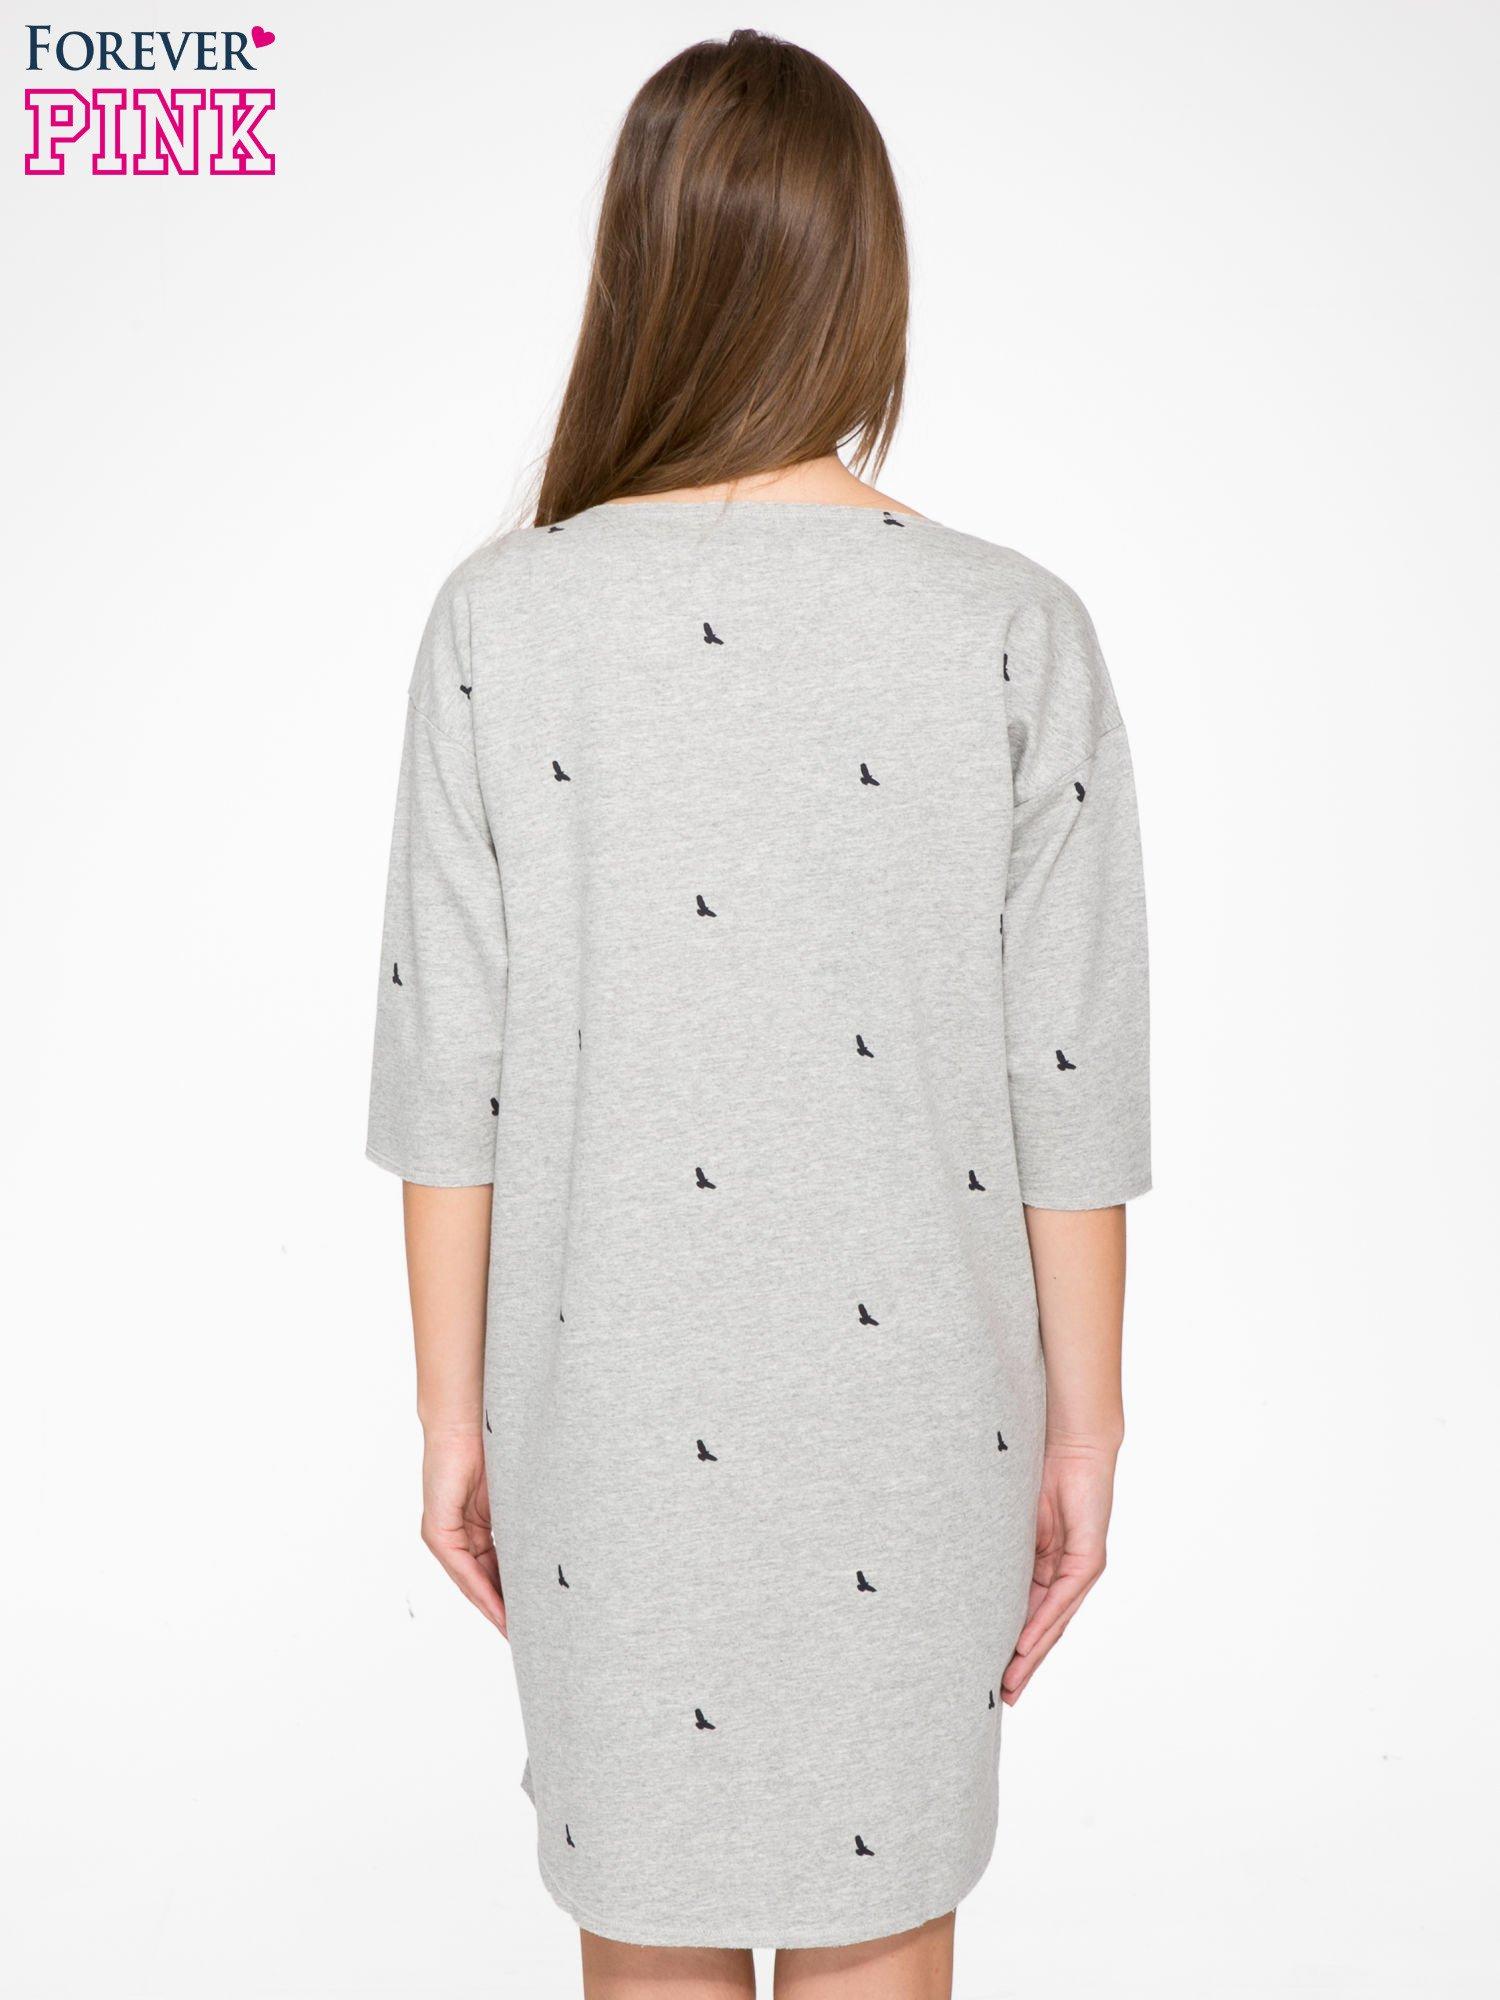 Szara sukienka oversize we wzór w ptaszki                                  zdj.                                  4